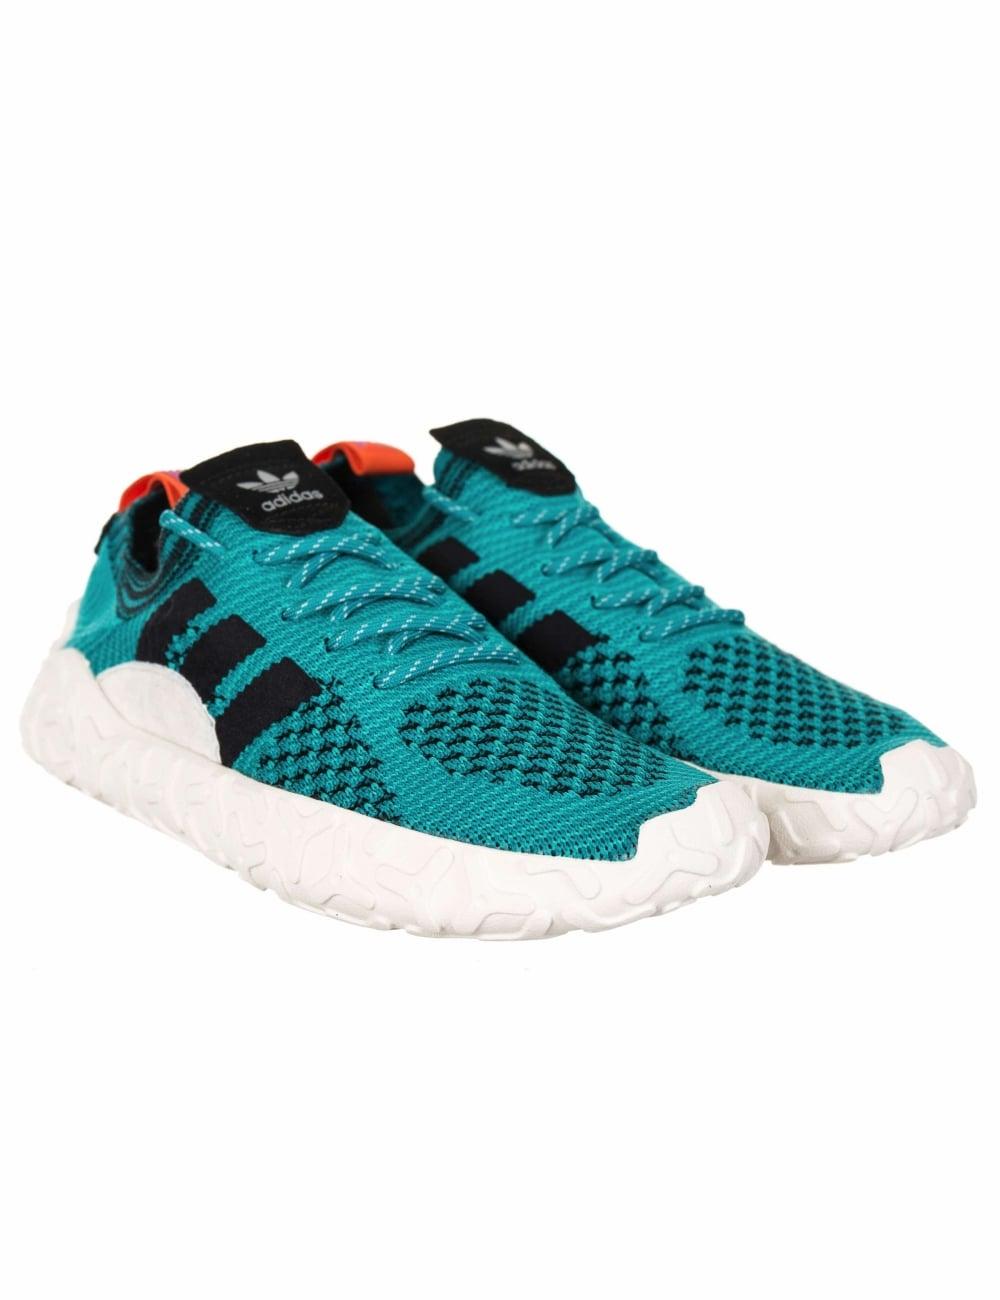 montar Modales mercenario  Adidas Originals F/22 Primeknit Trainers - Shock Green/Core Black - Footwear  from Fat Buddha Store UK